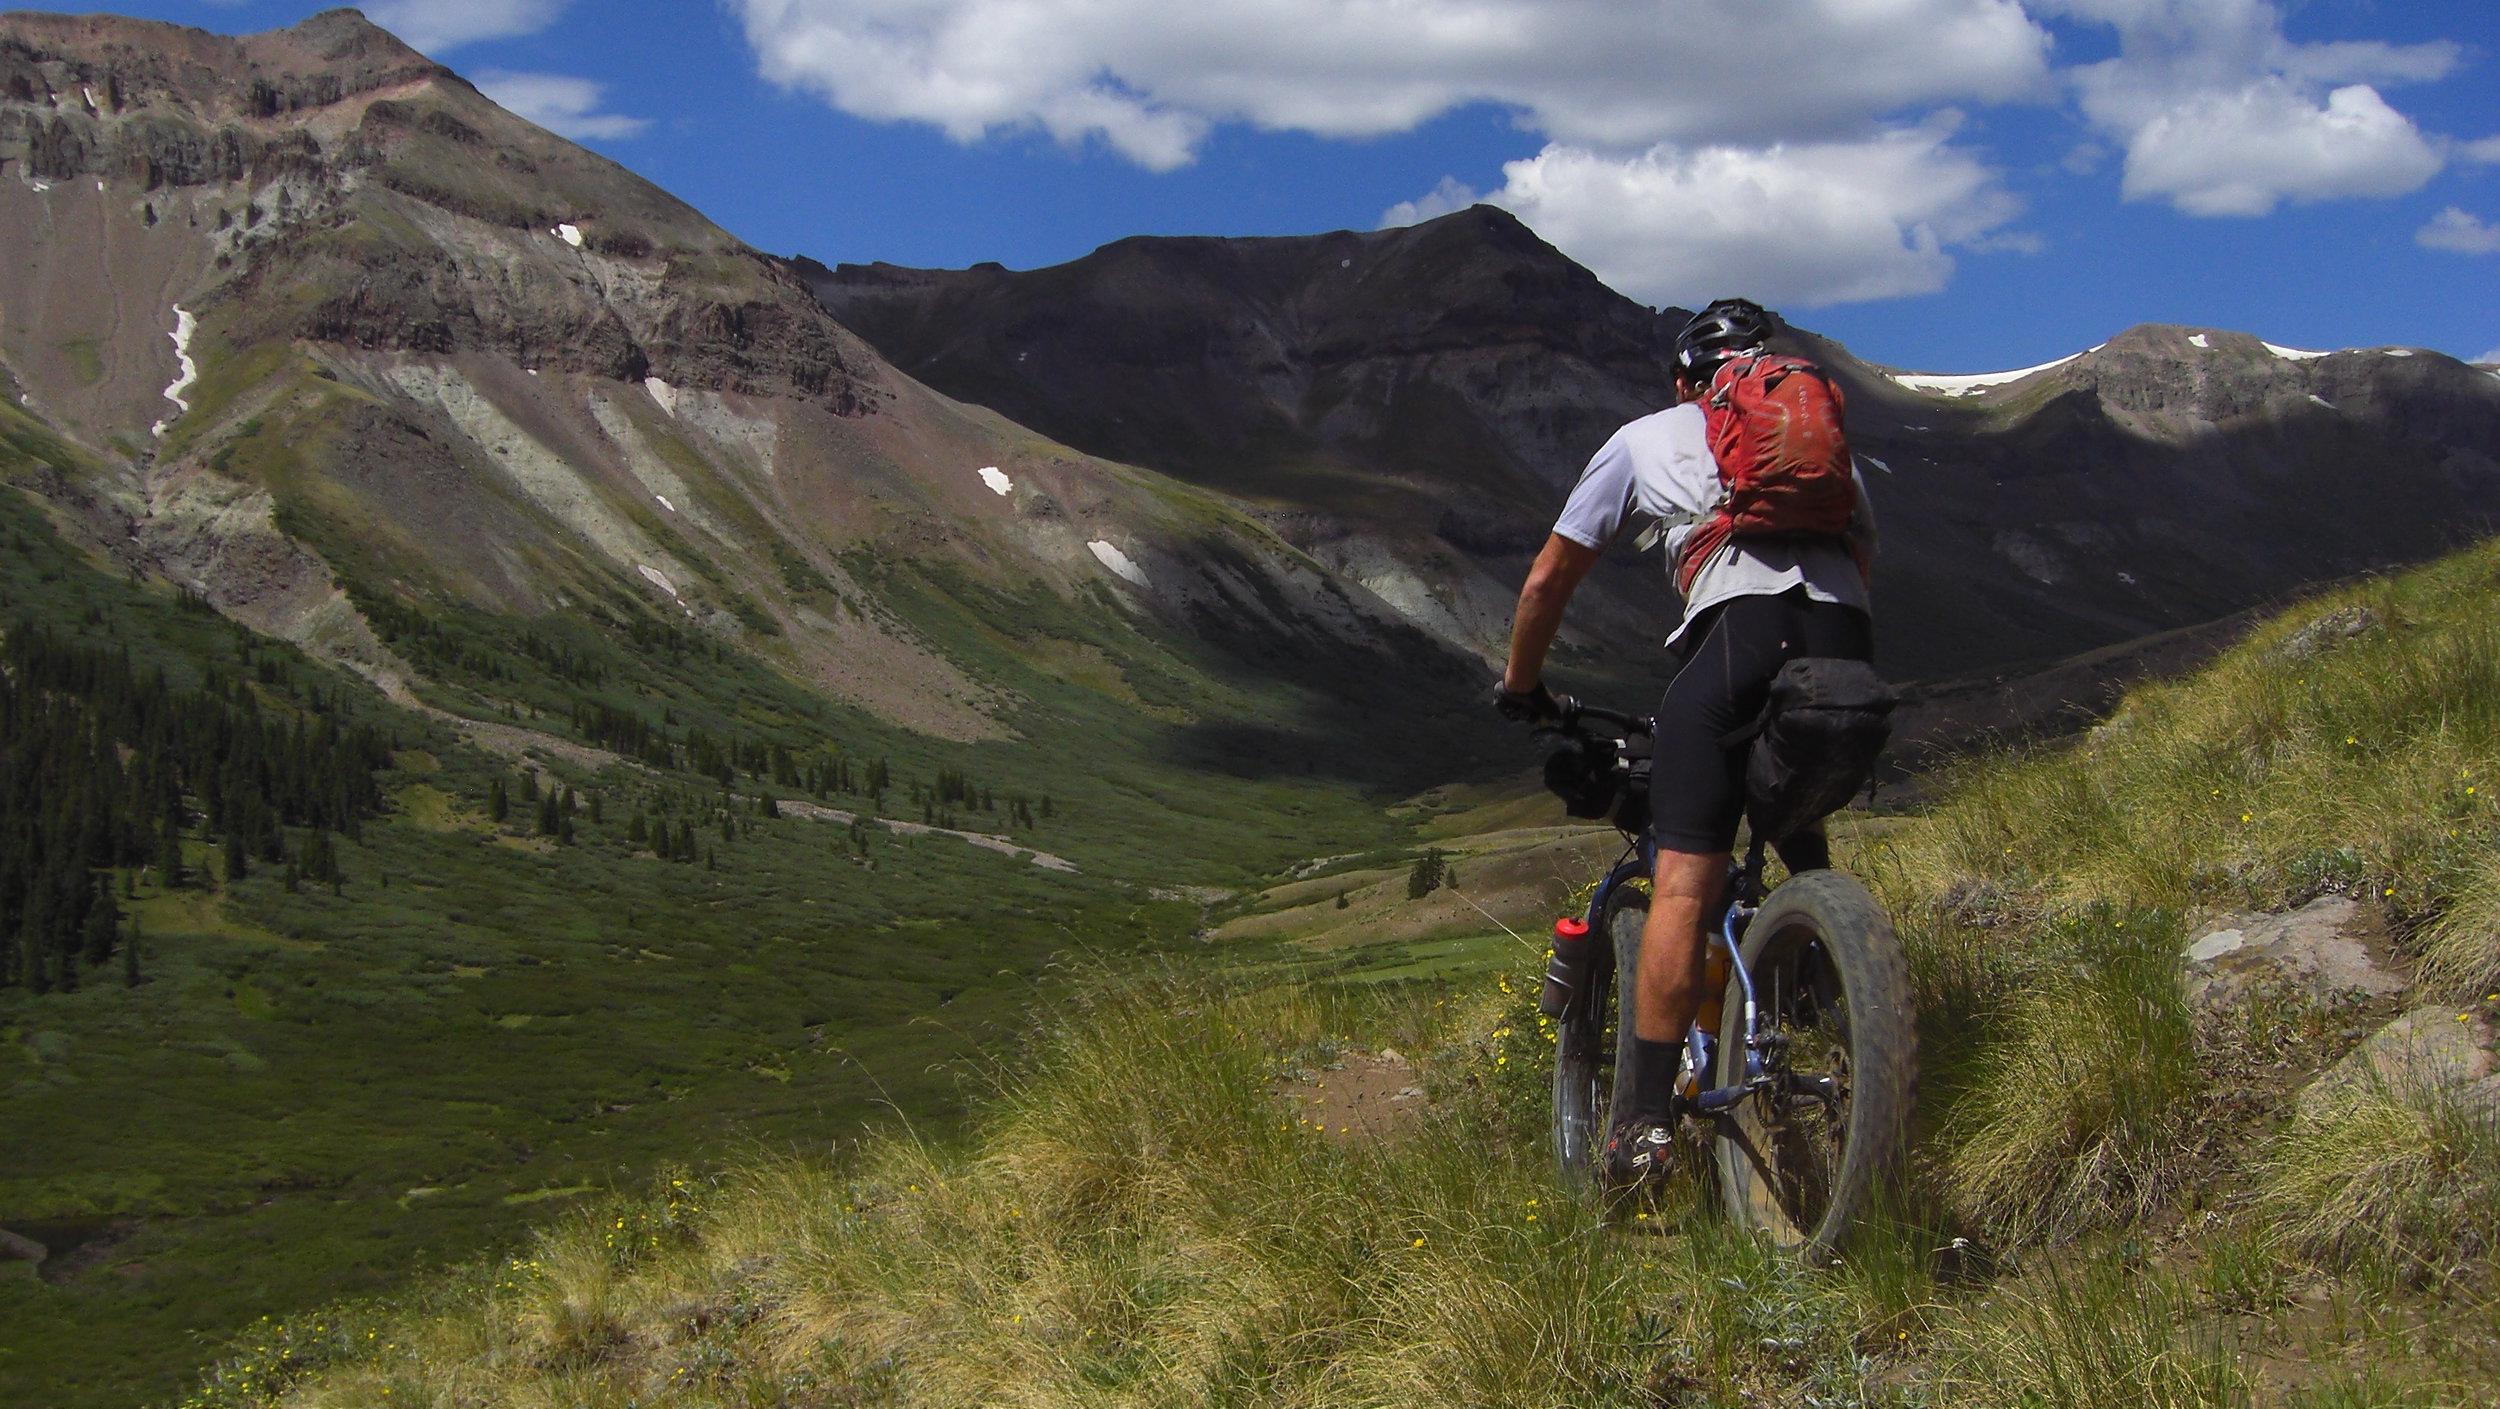 Touring the Colorado Trail